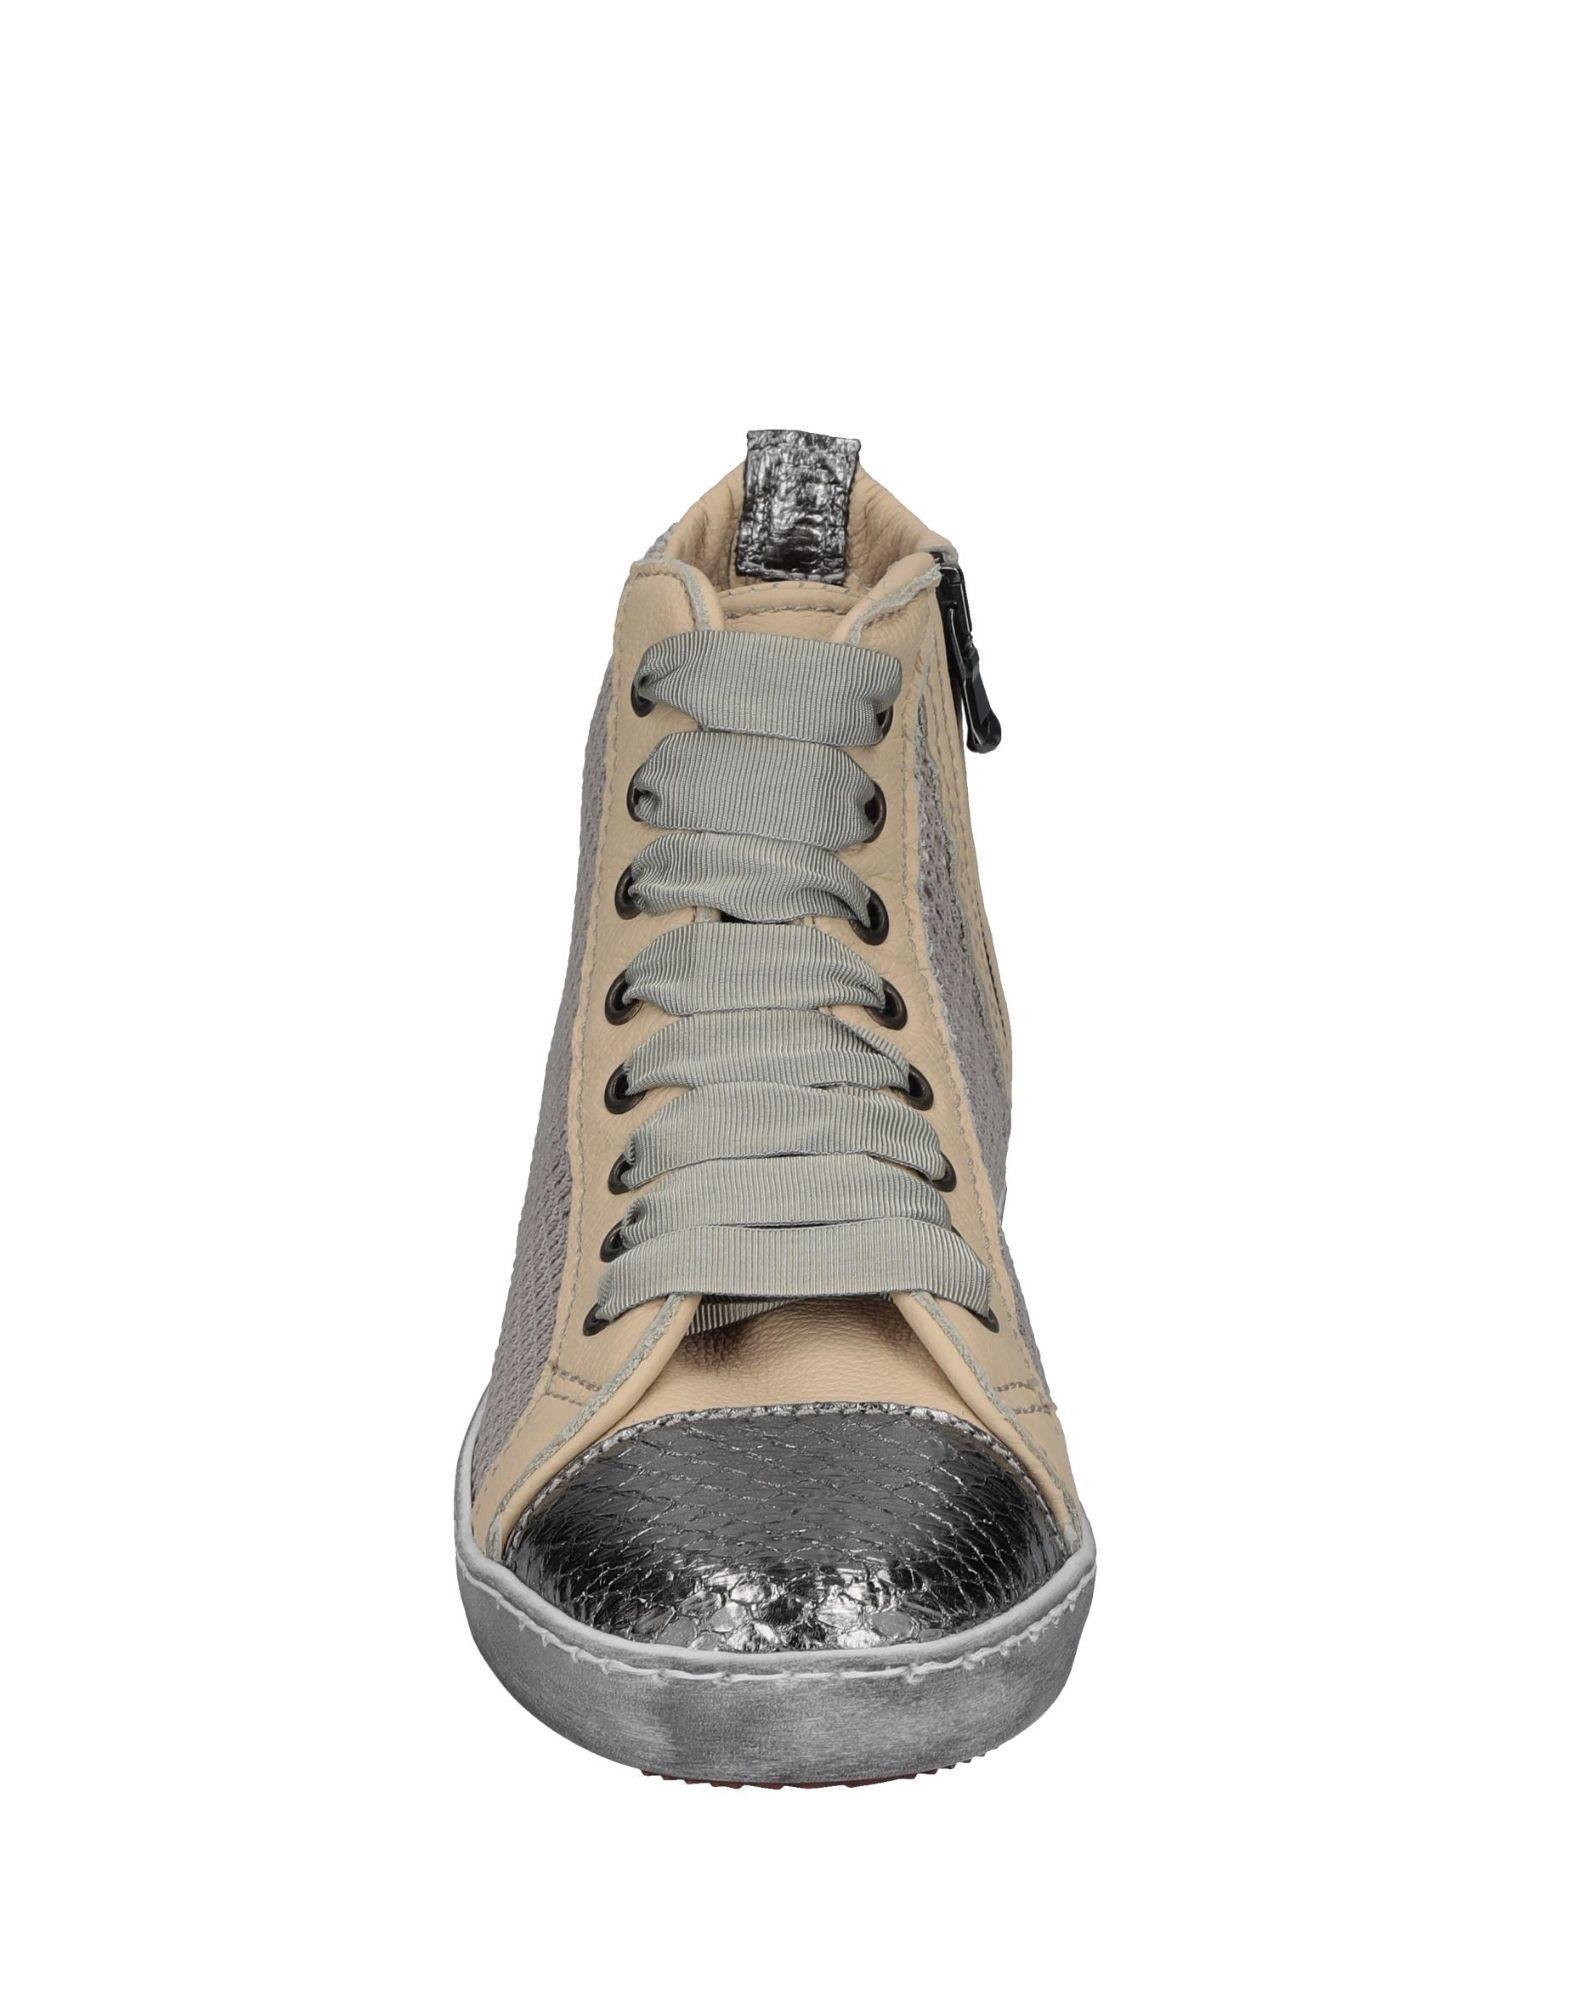 Rabatt Schuhe Cividini Sneakers  Damen  Sneakers 11528177UU 2493cc